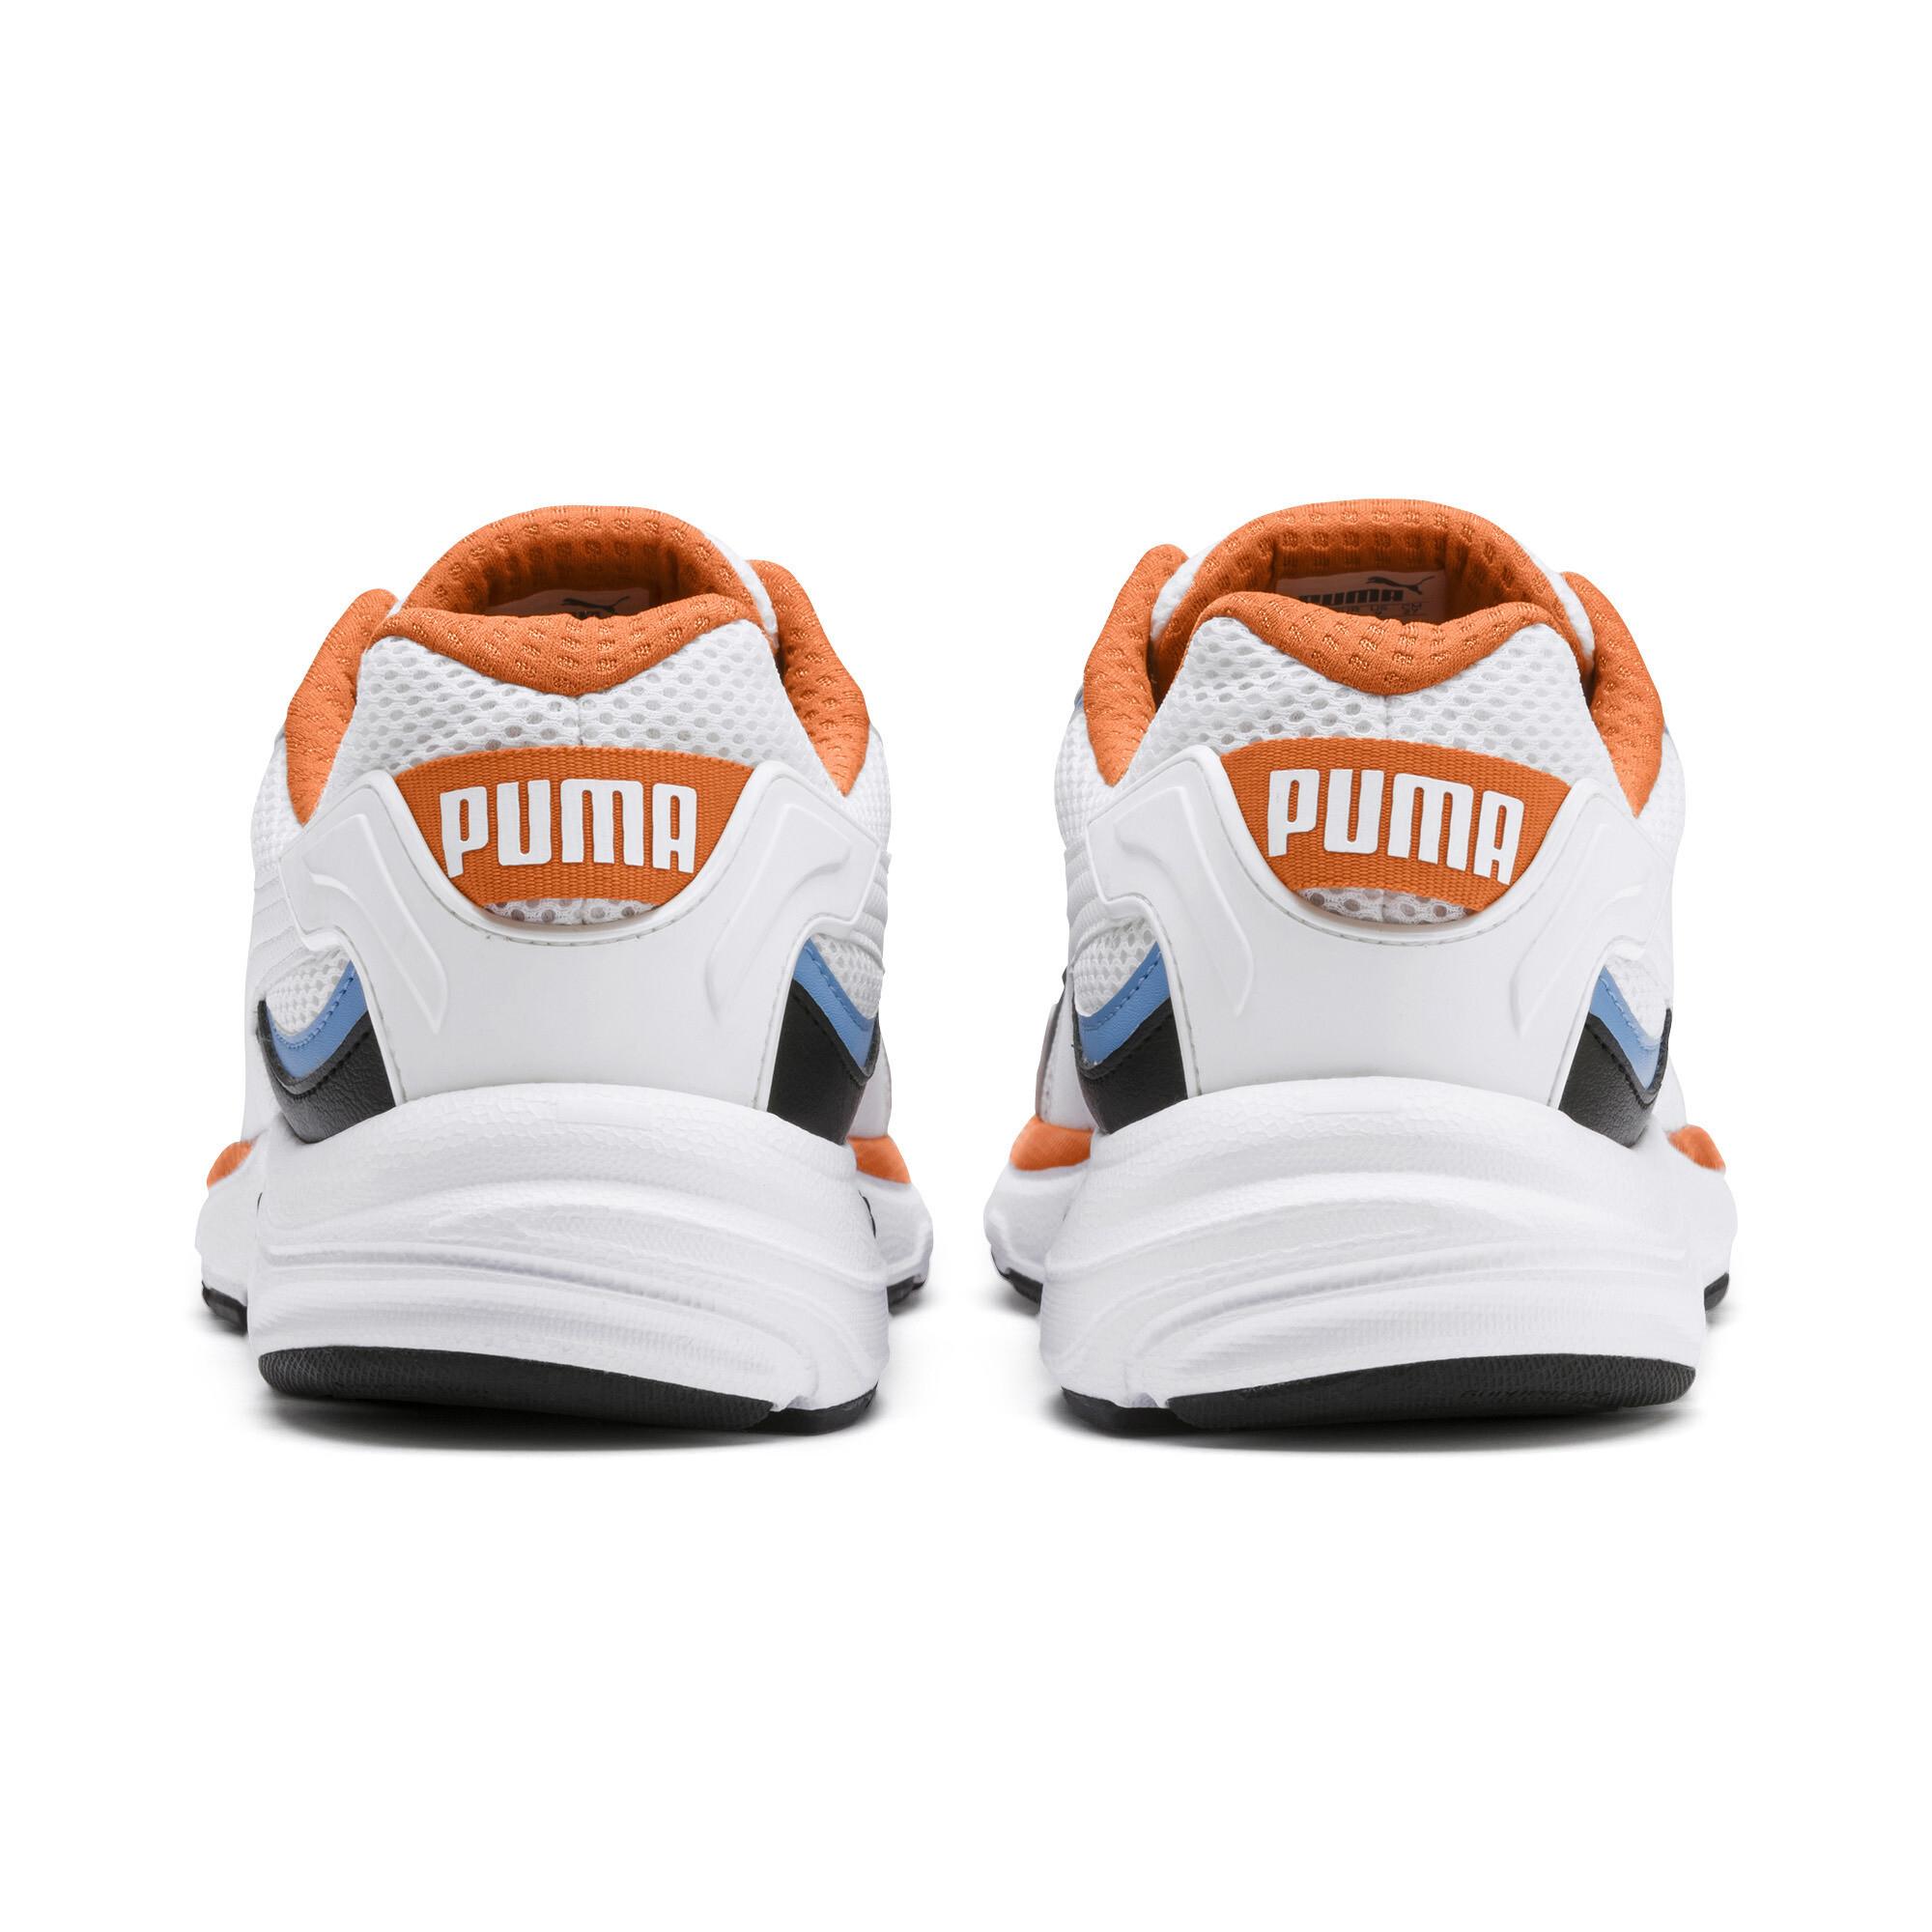 PUMA-Axis-Plus-90s-Sneakers-Men-Shoe-Basics thumbnail 16